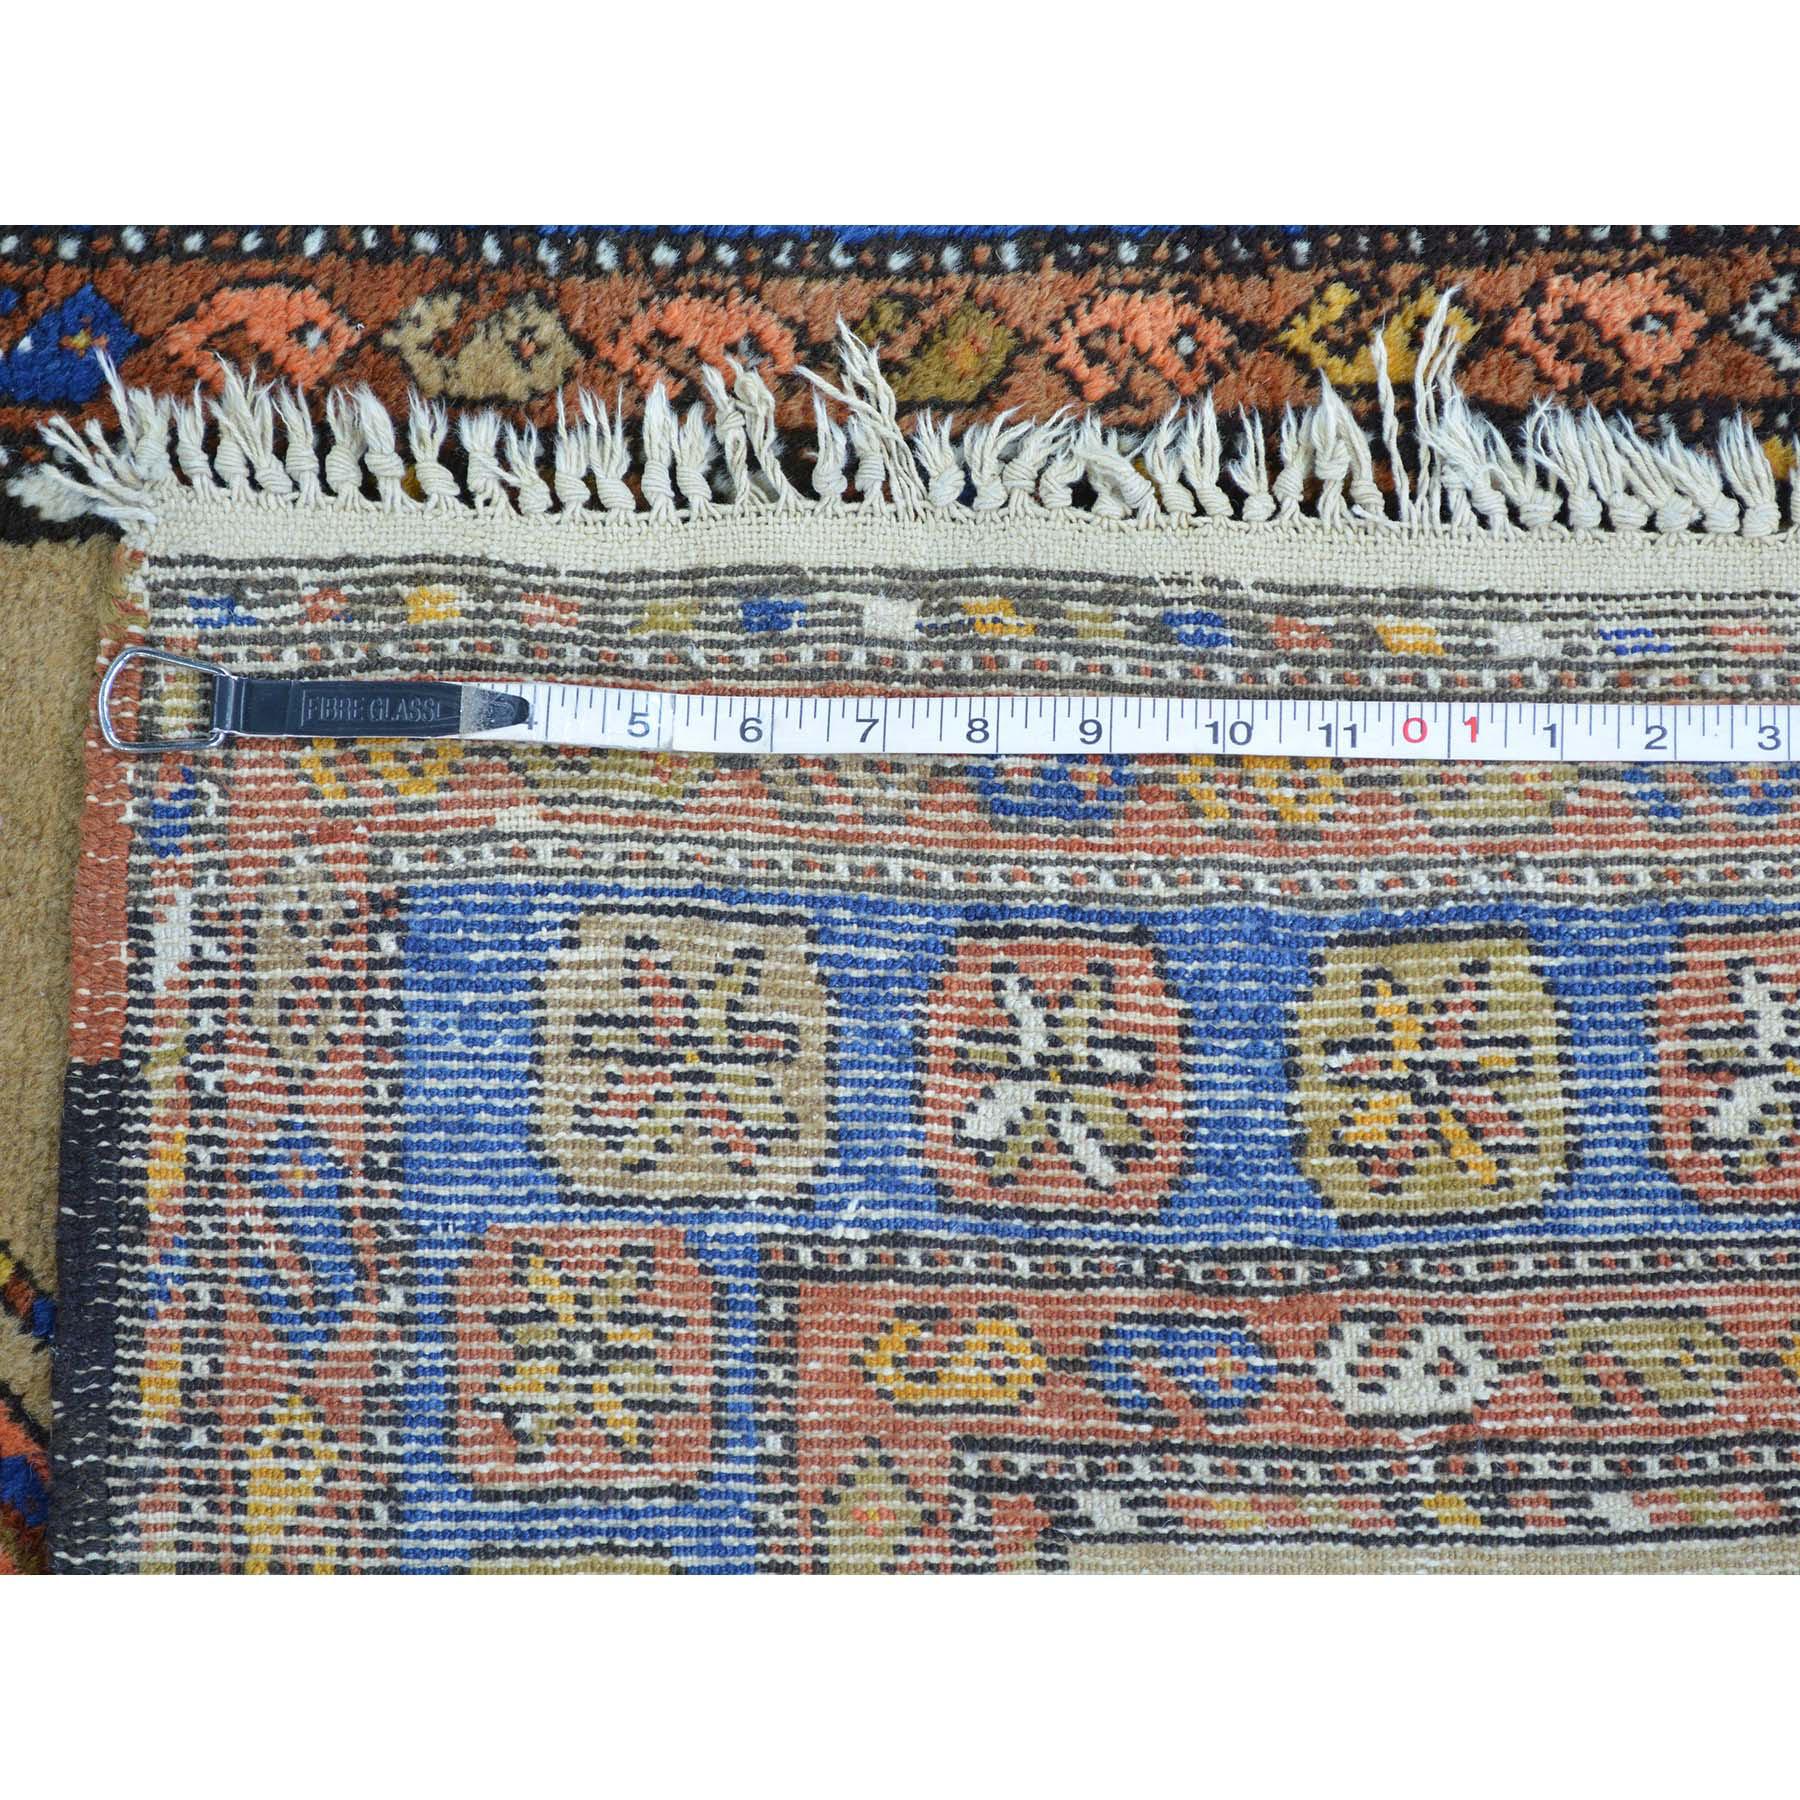 3-9 x14-4  Antique Persian Serab Camel Hair Exc Cond XL Runner Rug